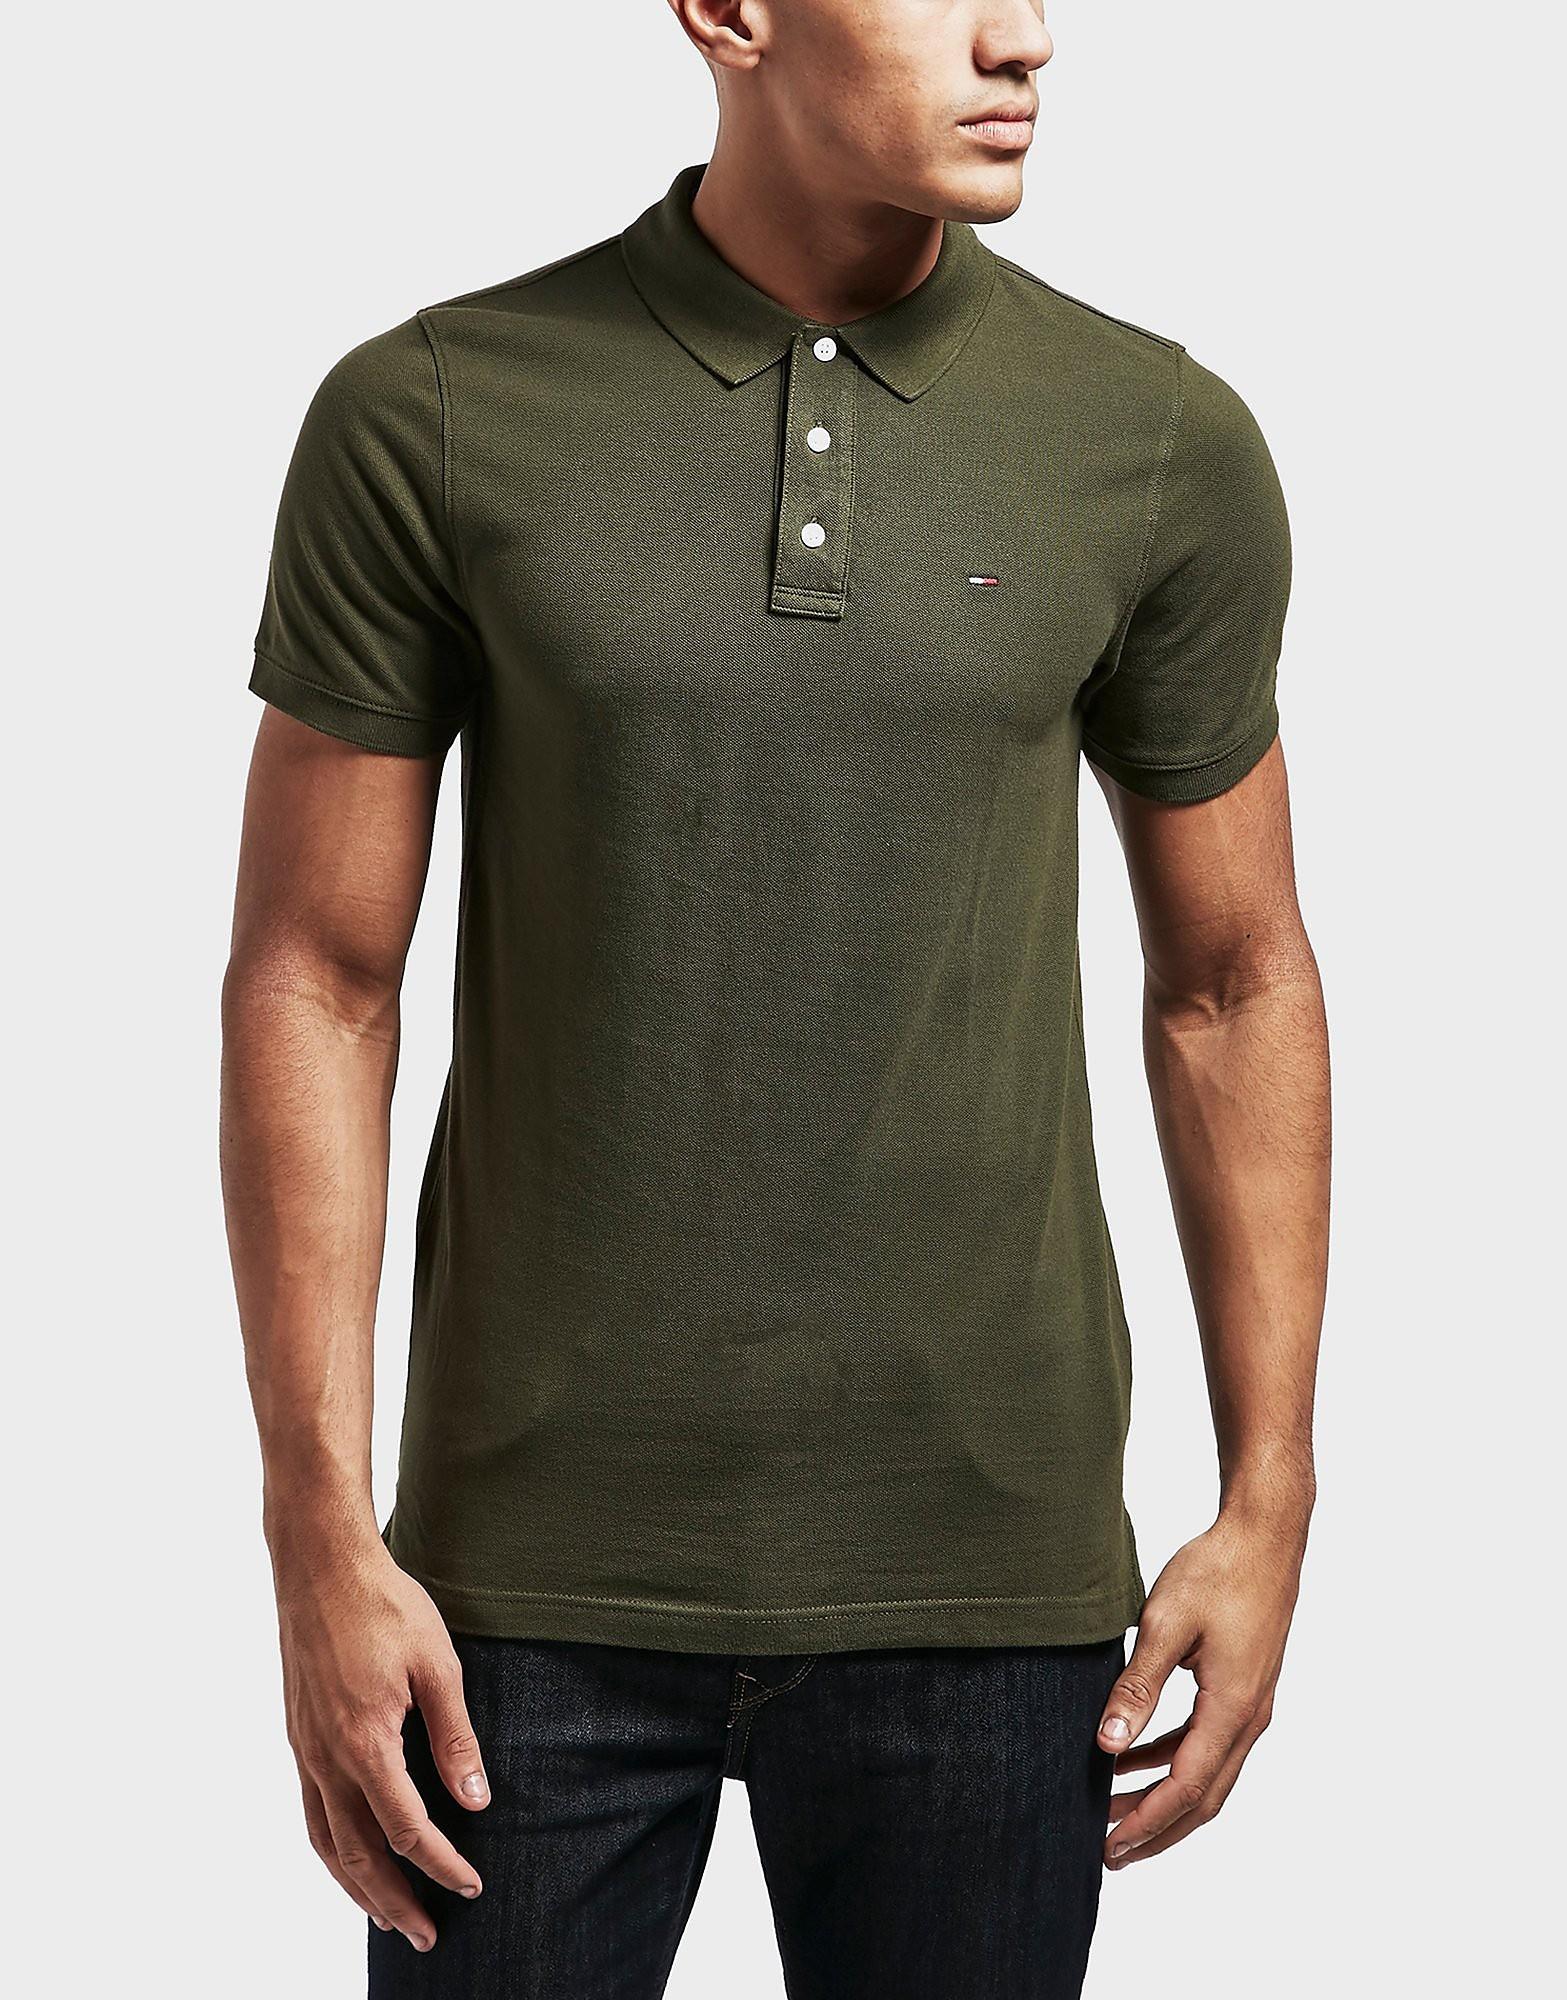 Tommy Hilfiger Basic Short Sleeve Polo Shirt